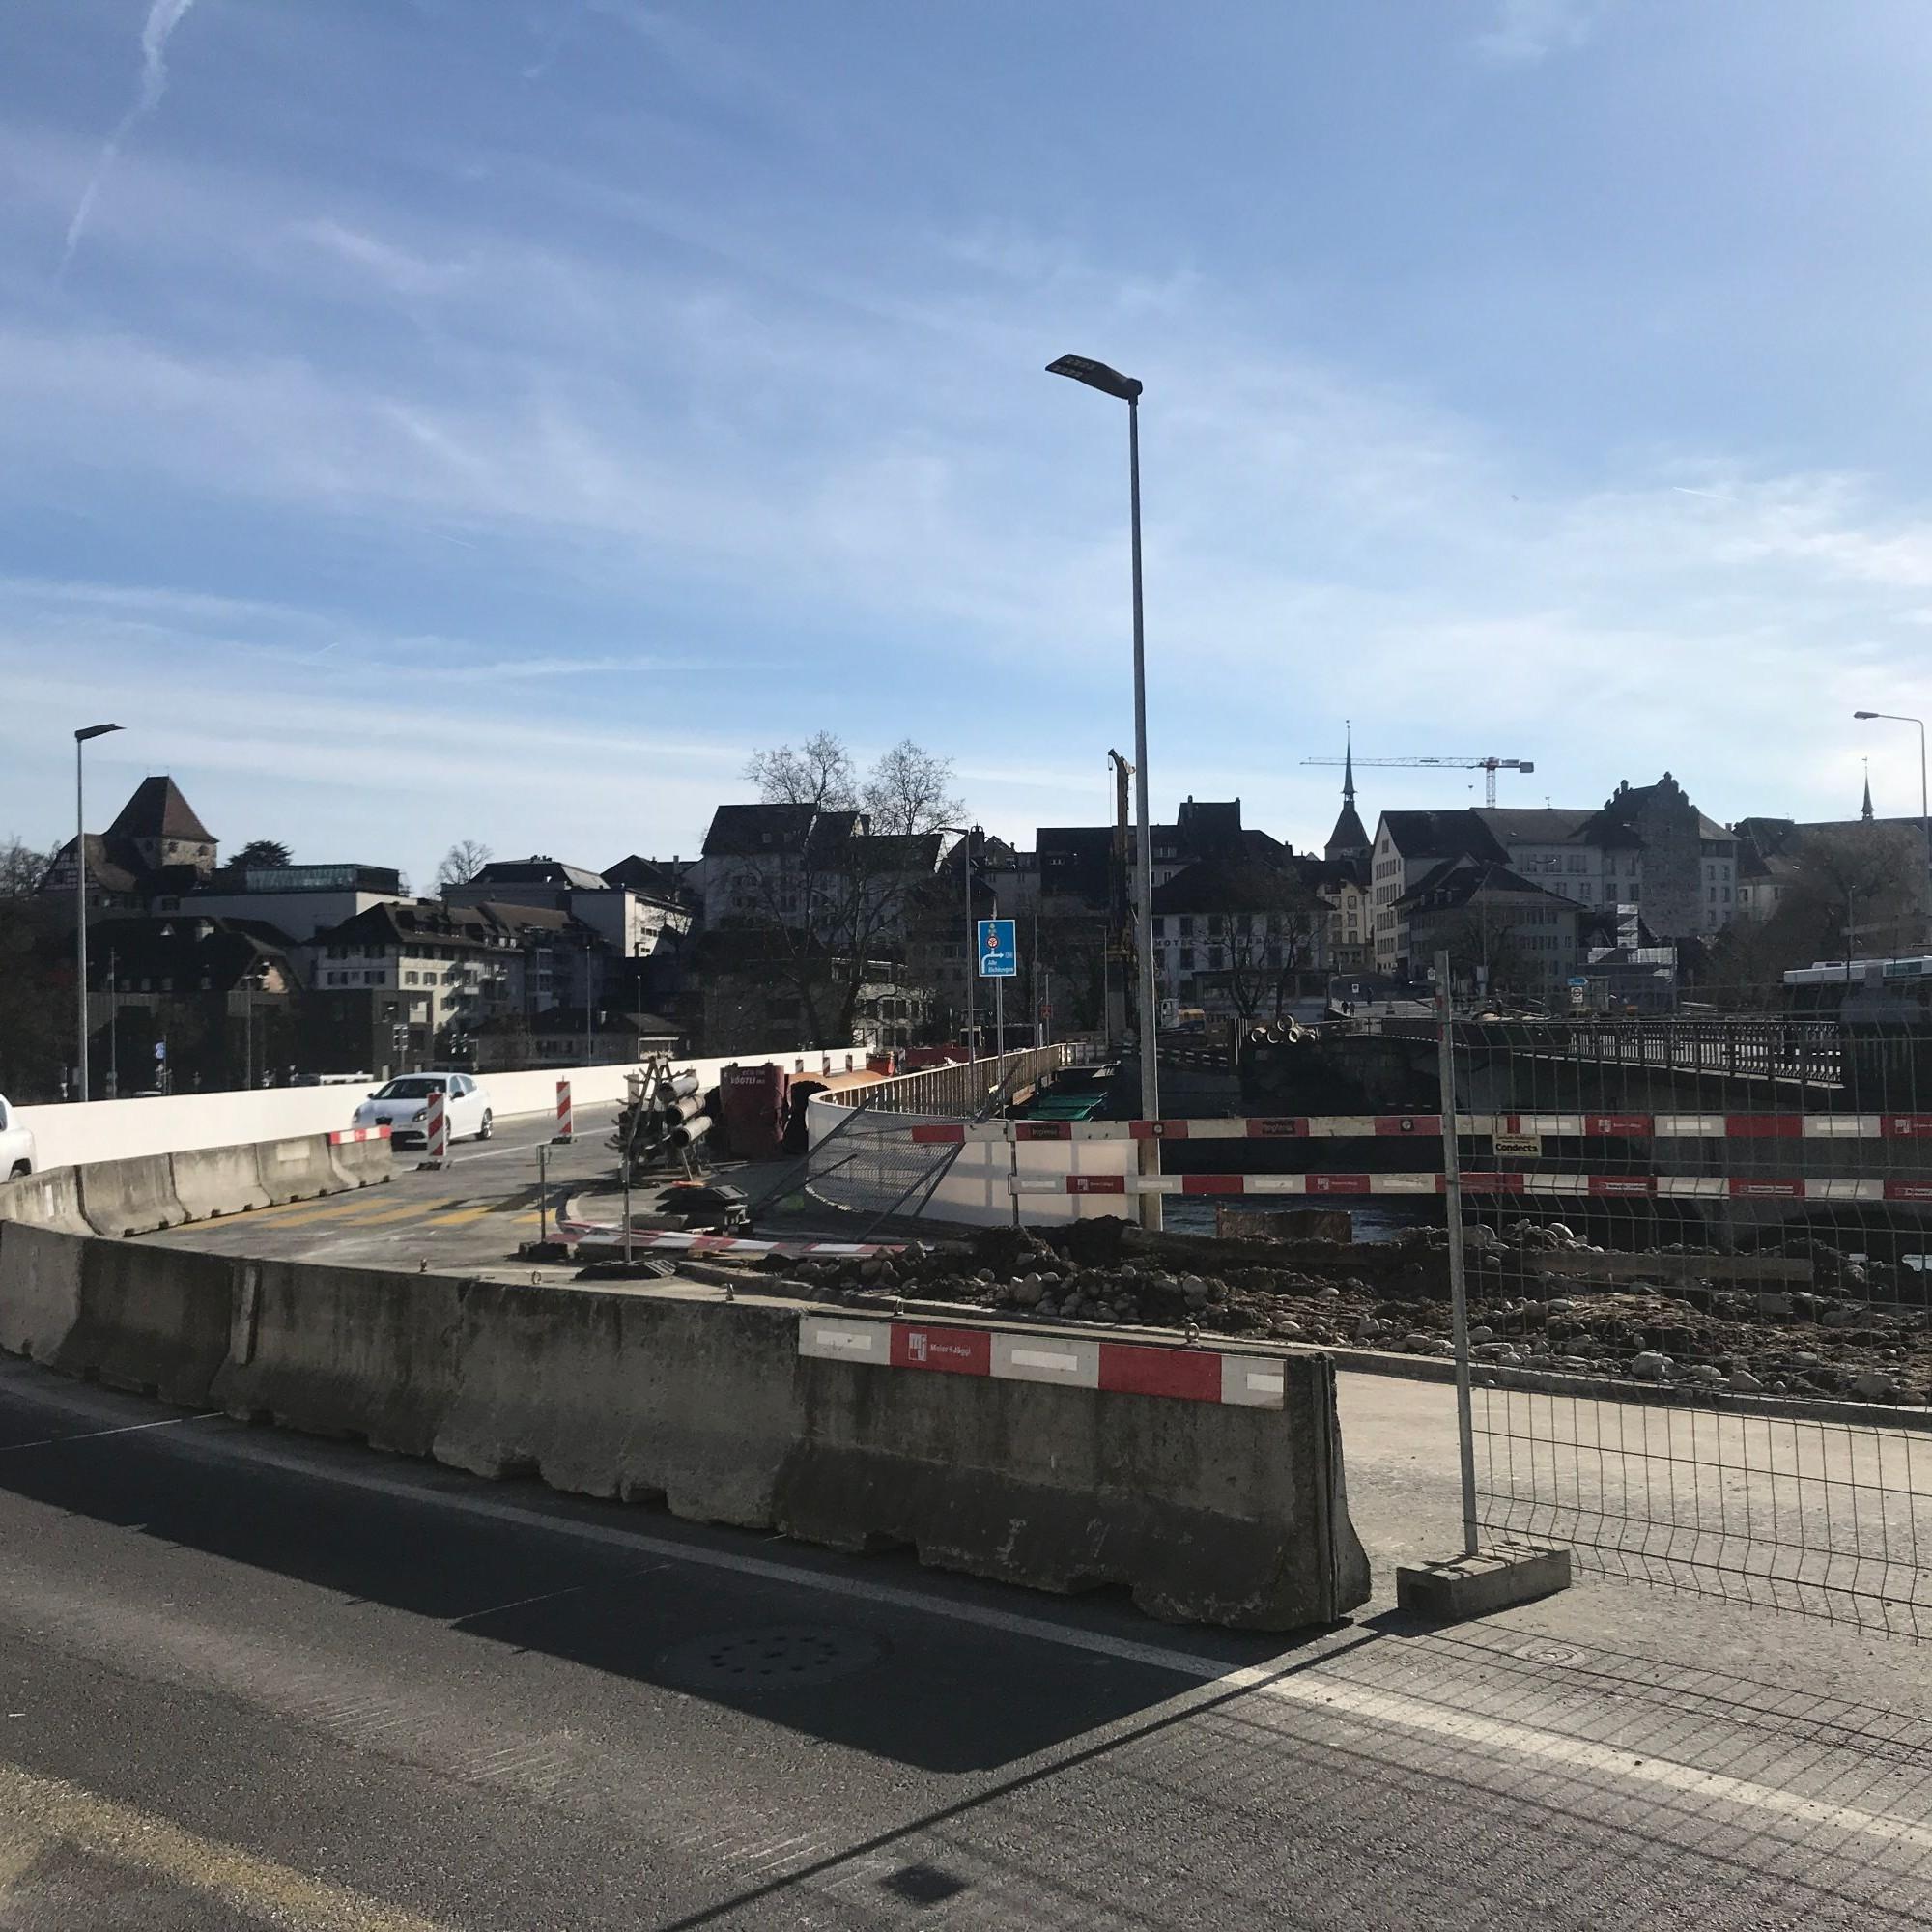 Aarauer Hilfsbrücke freigegeben